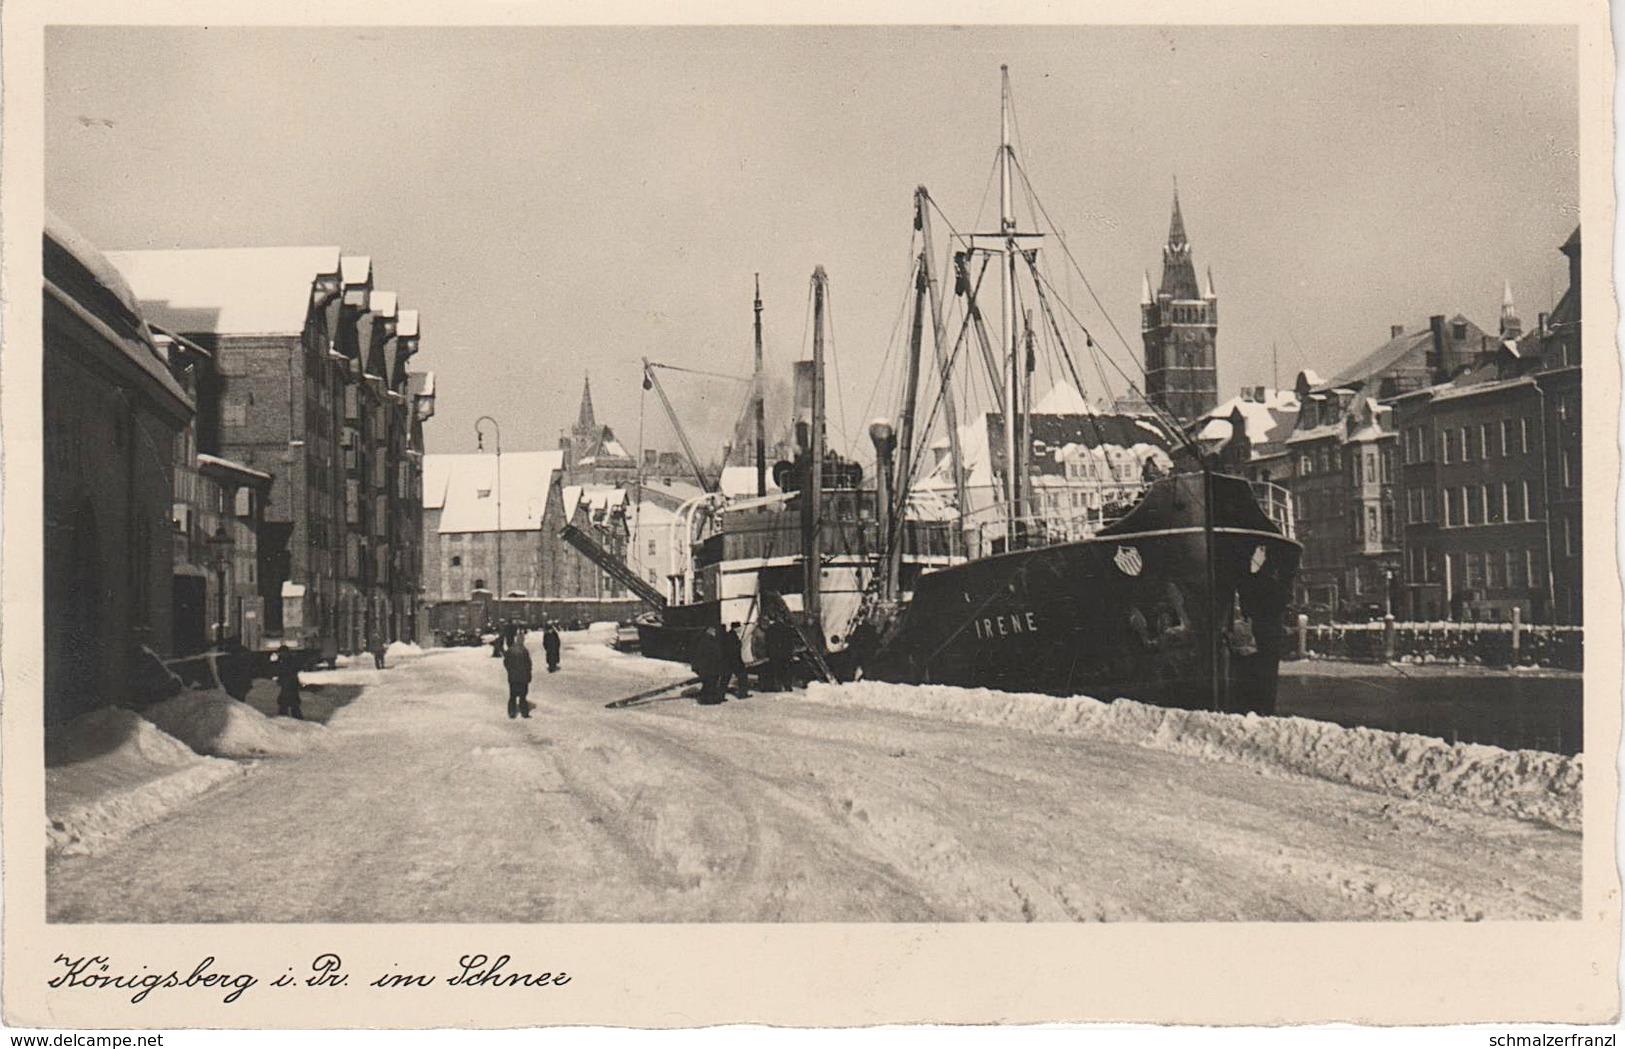 AK Königsberg Kaliningrad Калинингра́д Pregel Speicher Dampfer Irene Hafen Winter Schnee A Tilsit Sowetsk Memel Klaipeda - Ostpreussen